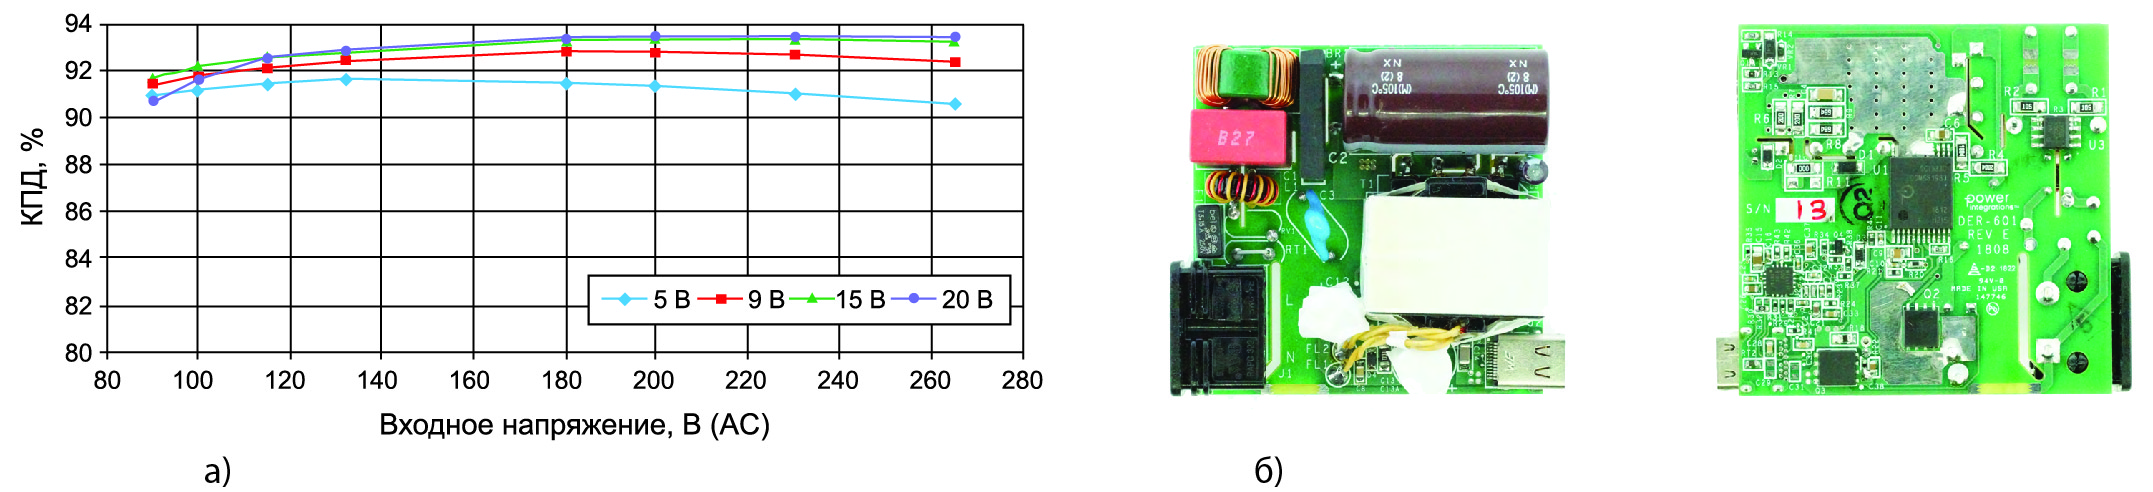 DER-601 — зарядное USB-PD устройство широкого диапазона мощности до 60 Вт, выполненное на базе контроллера InnoSwitch3-CP INN3279C-H215